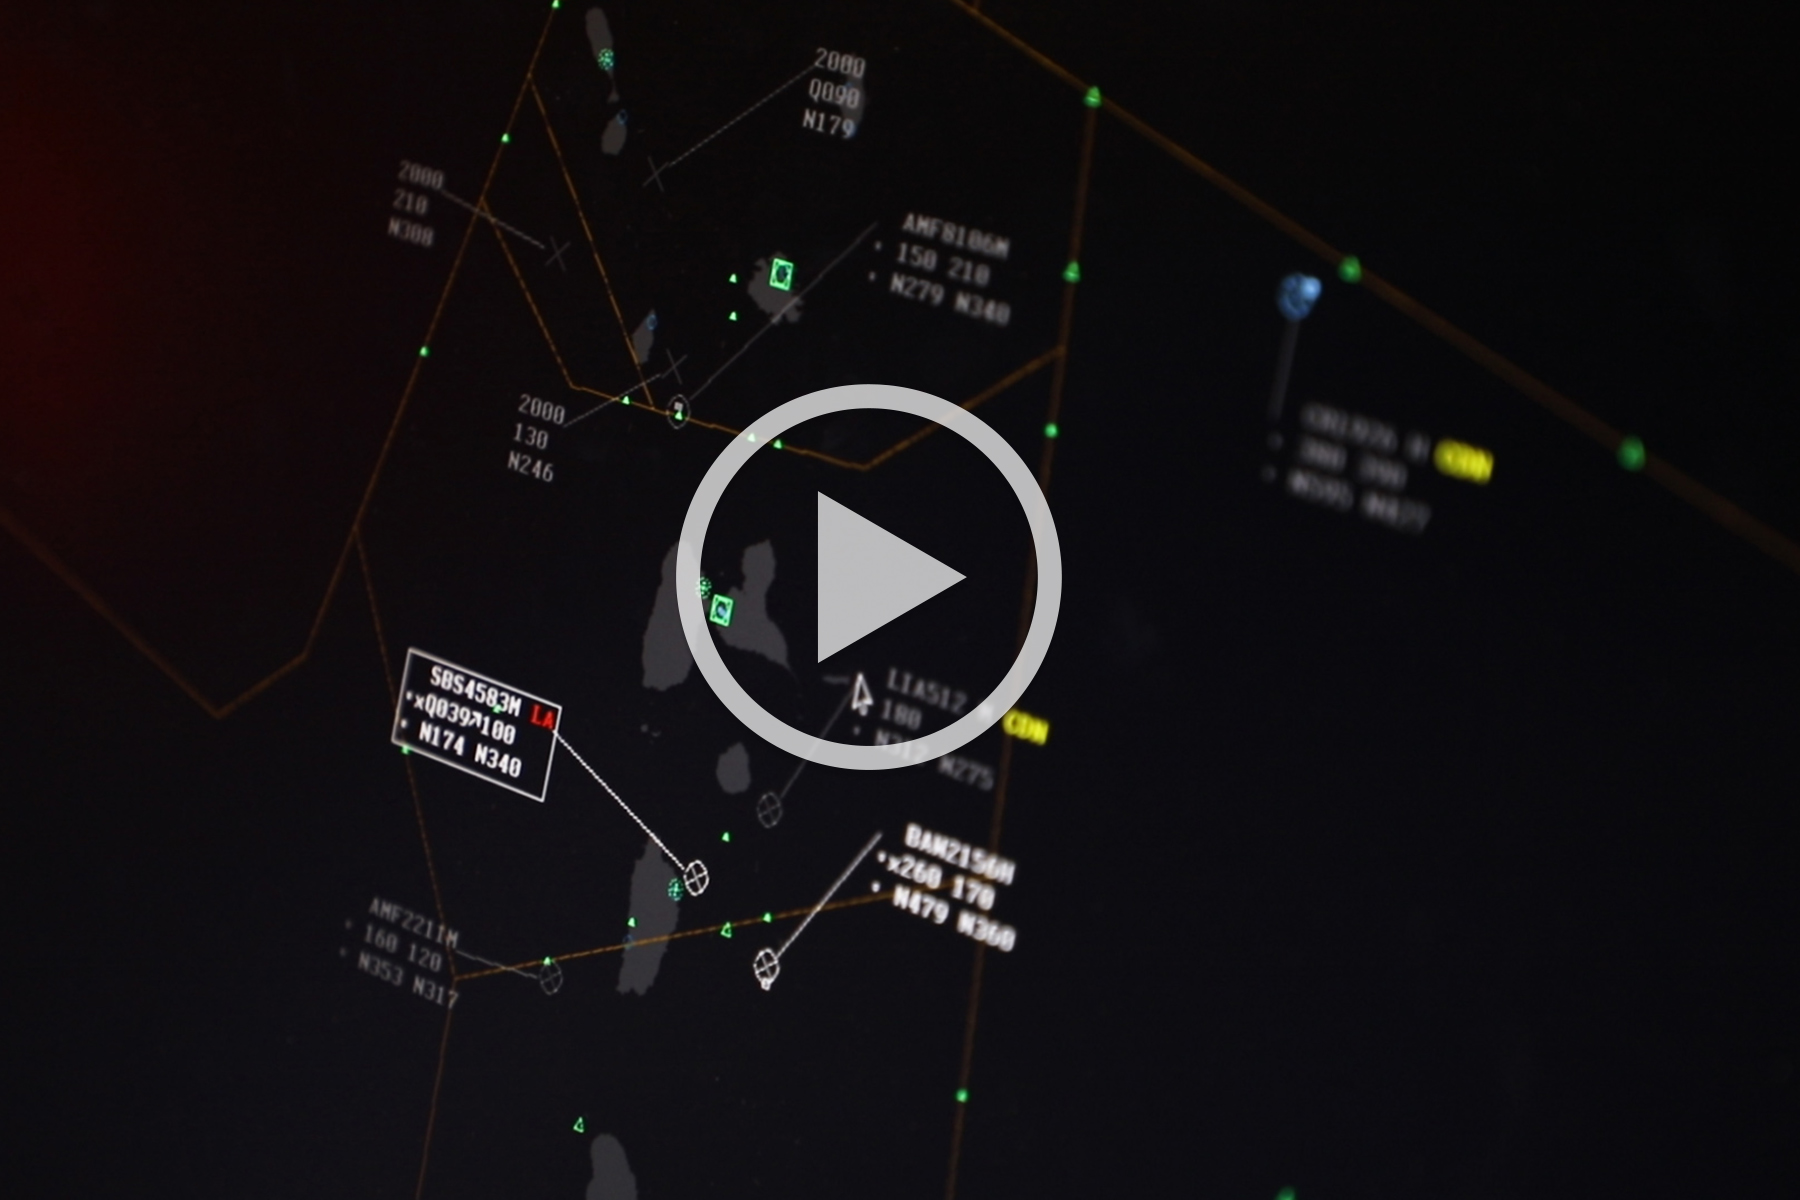 Aurora ATM video